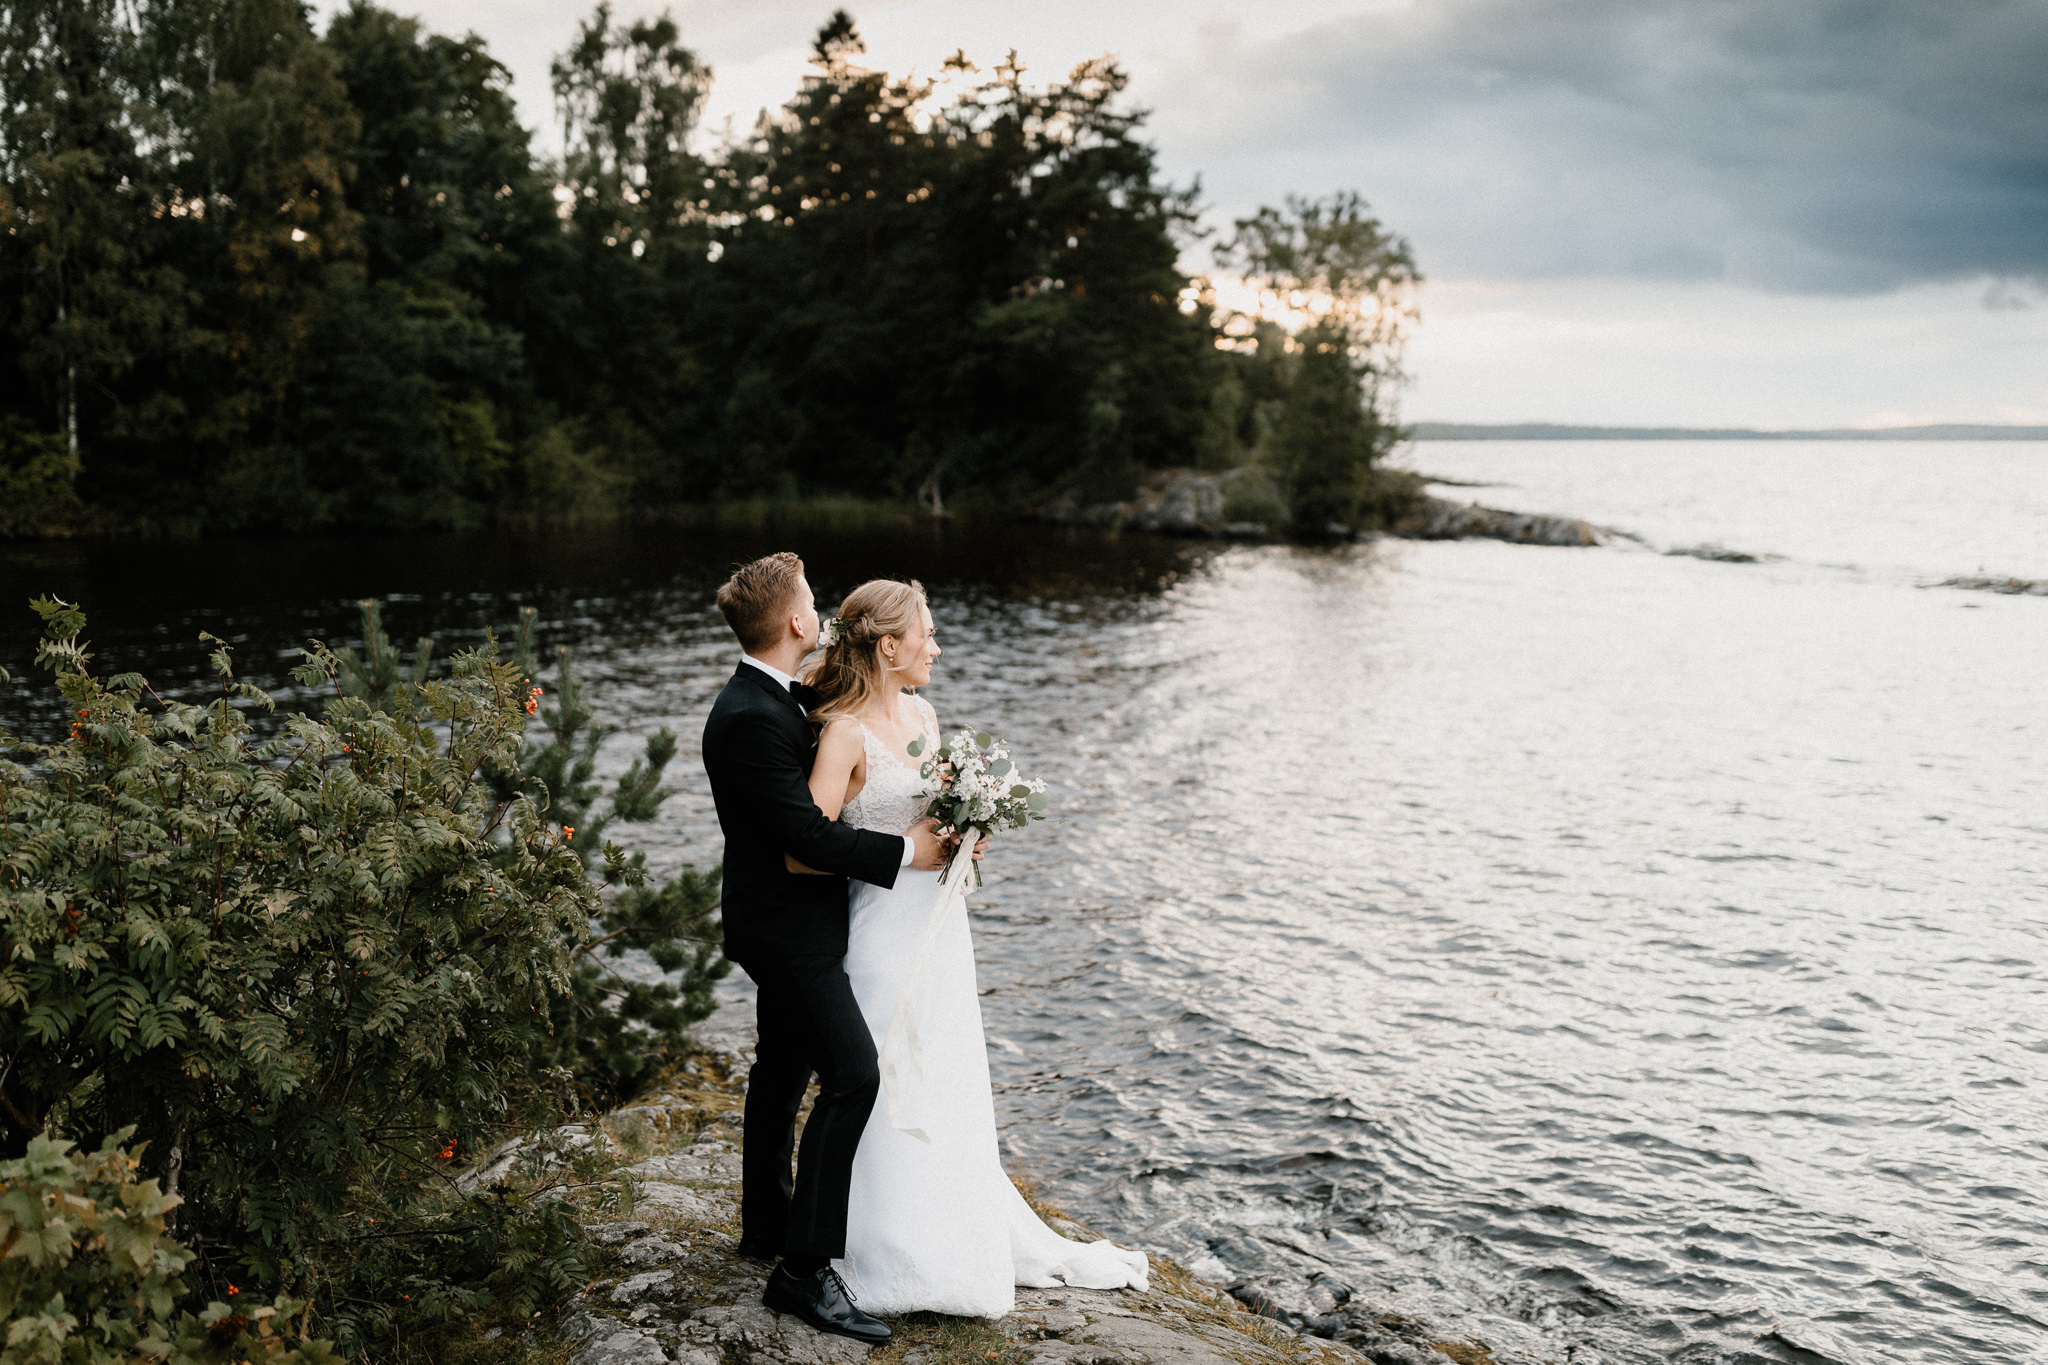 Johanna + Mikko - Tampere - Photo by Patrick Karkkolainen Wedding Photographer-130.jpg